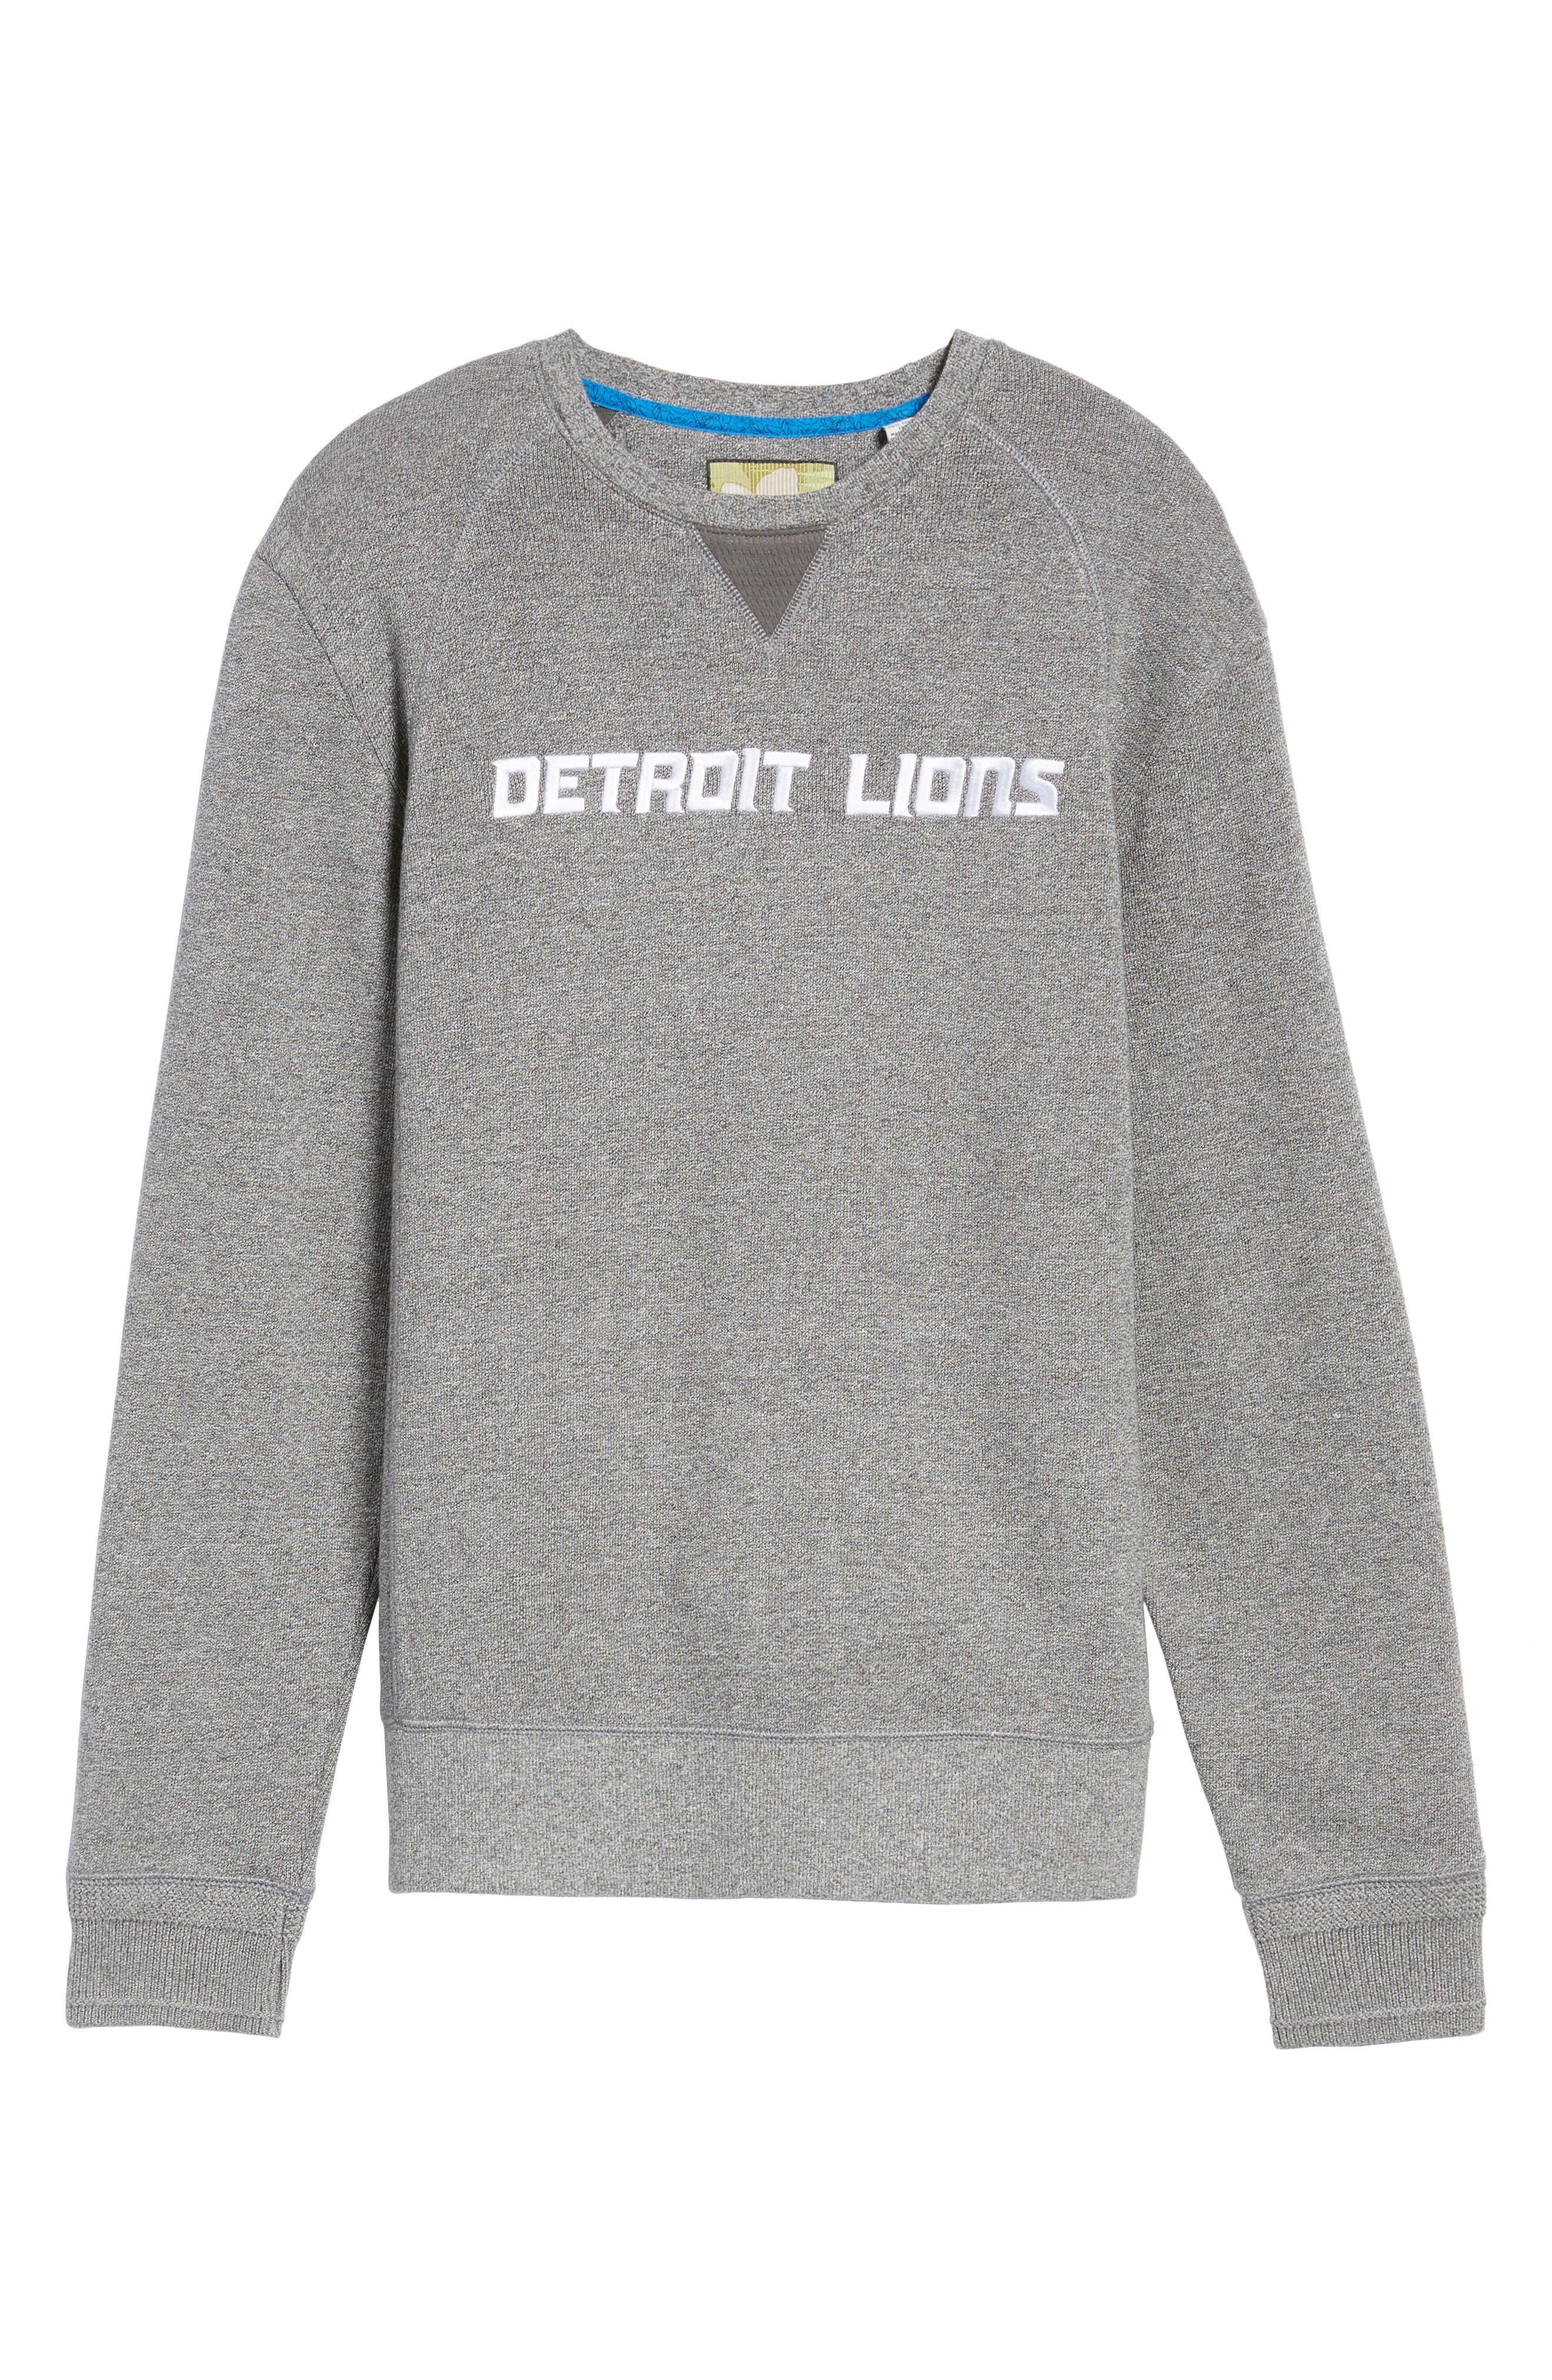 NFL Stitch of Liberty Embroidered Crewneck Sweatshirt,                             Alternate thumbnail 170, color,